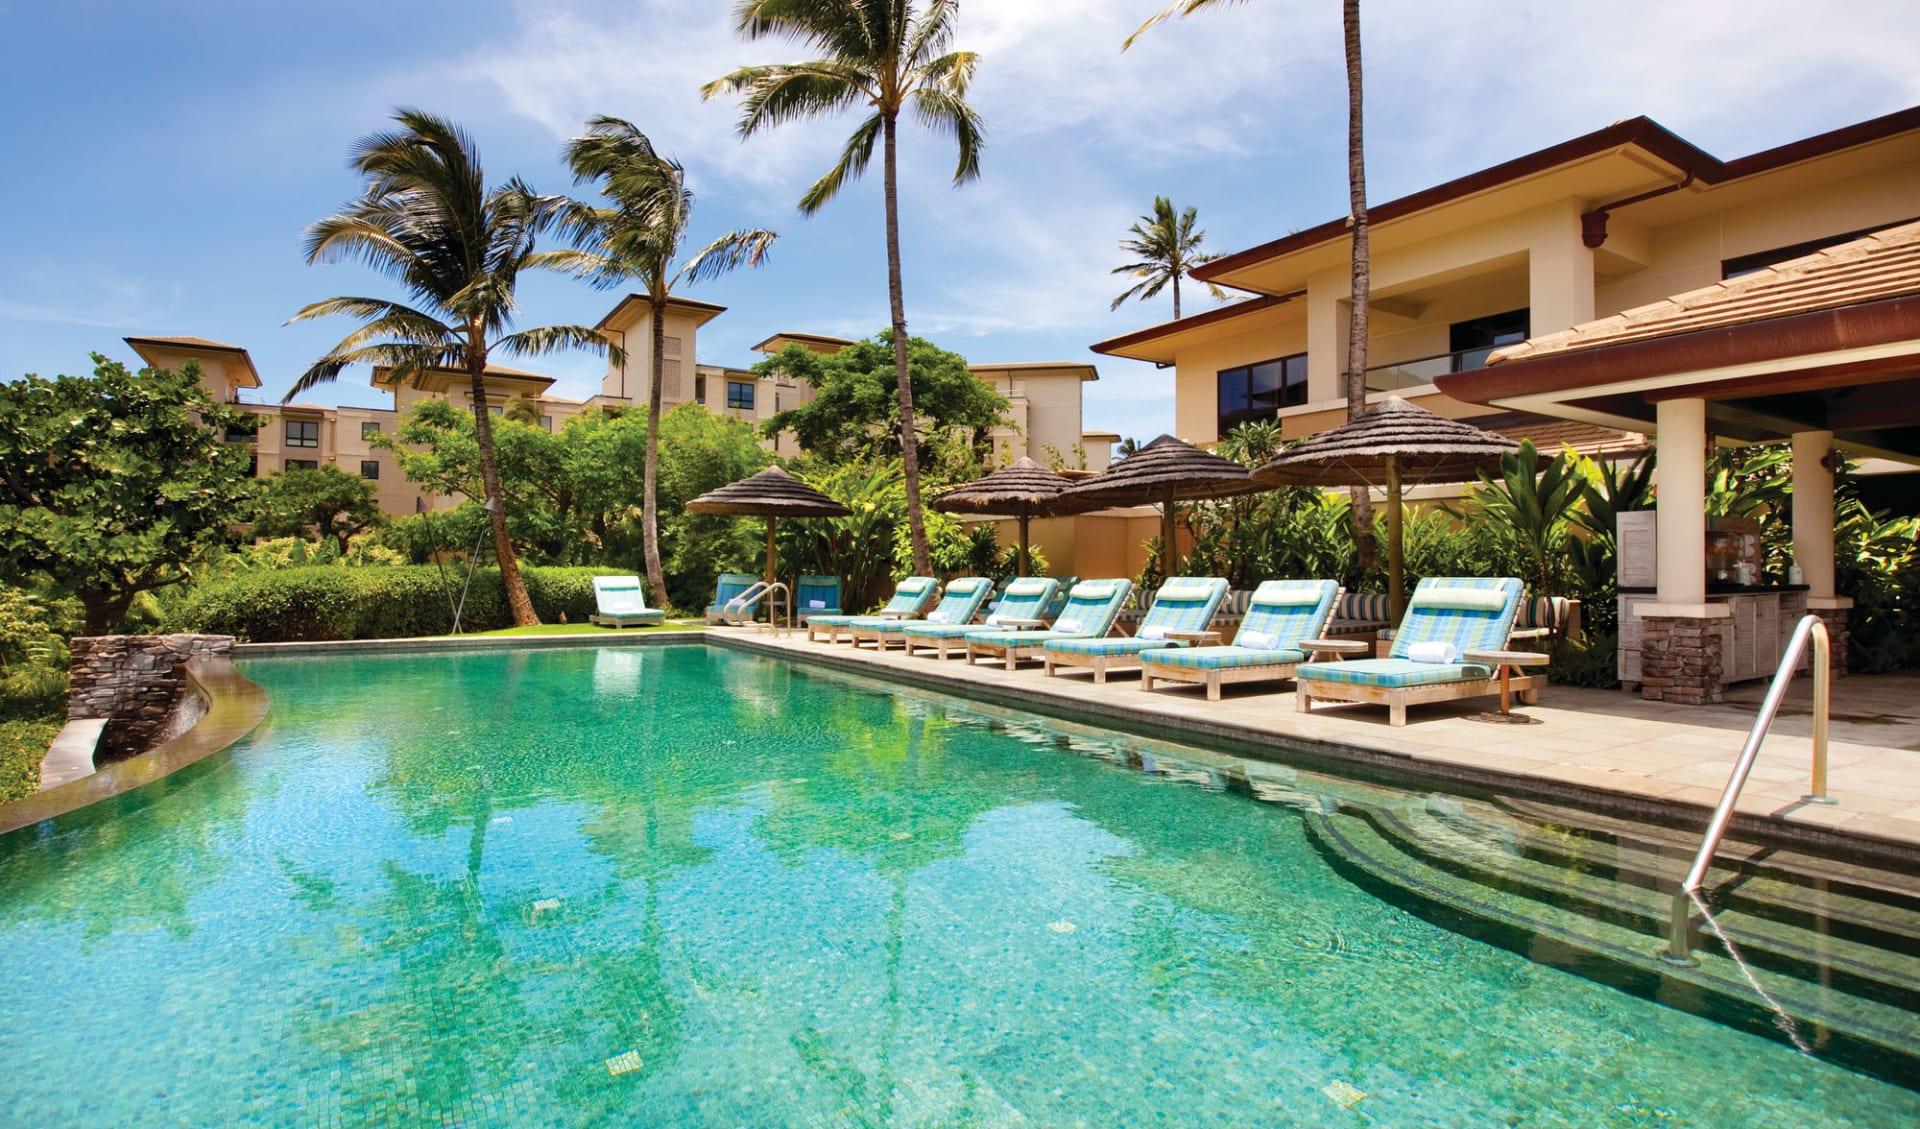 The Kapalua Villas in Kapalua - Maui: Facilities_Kapalua Villas_Pool und Spa-Bereich_ATI